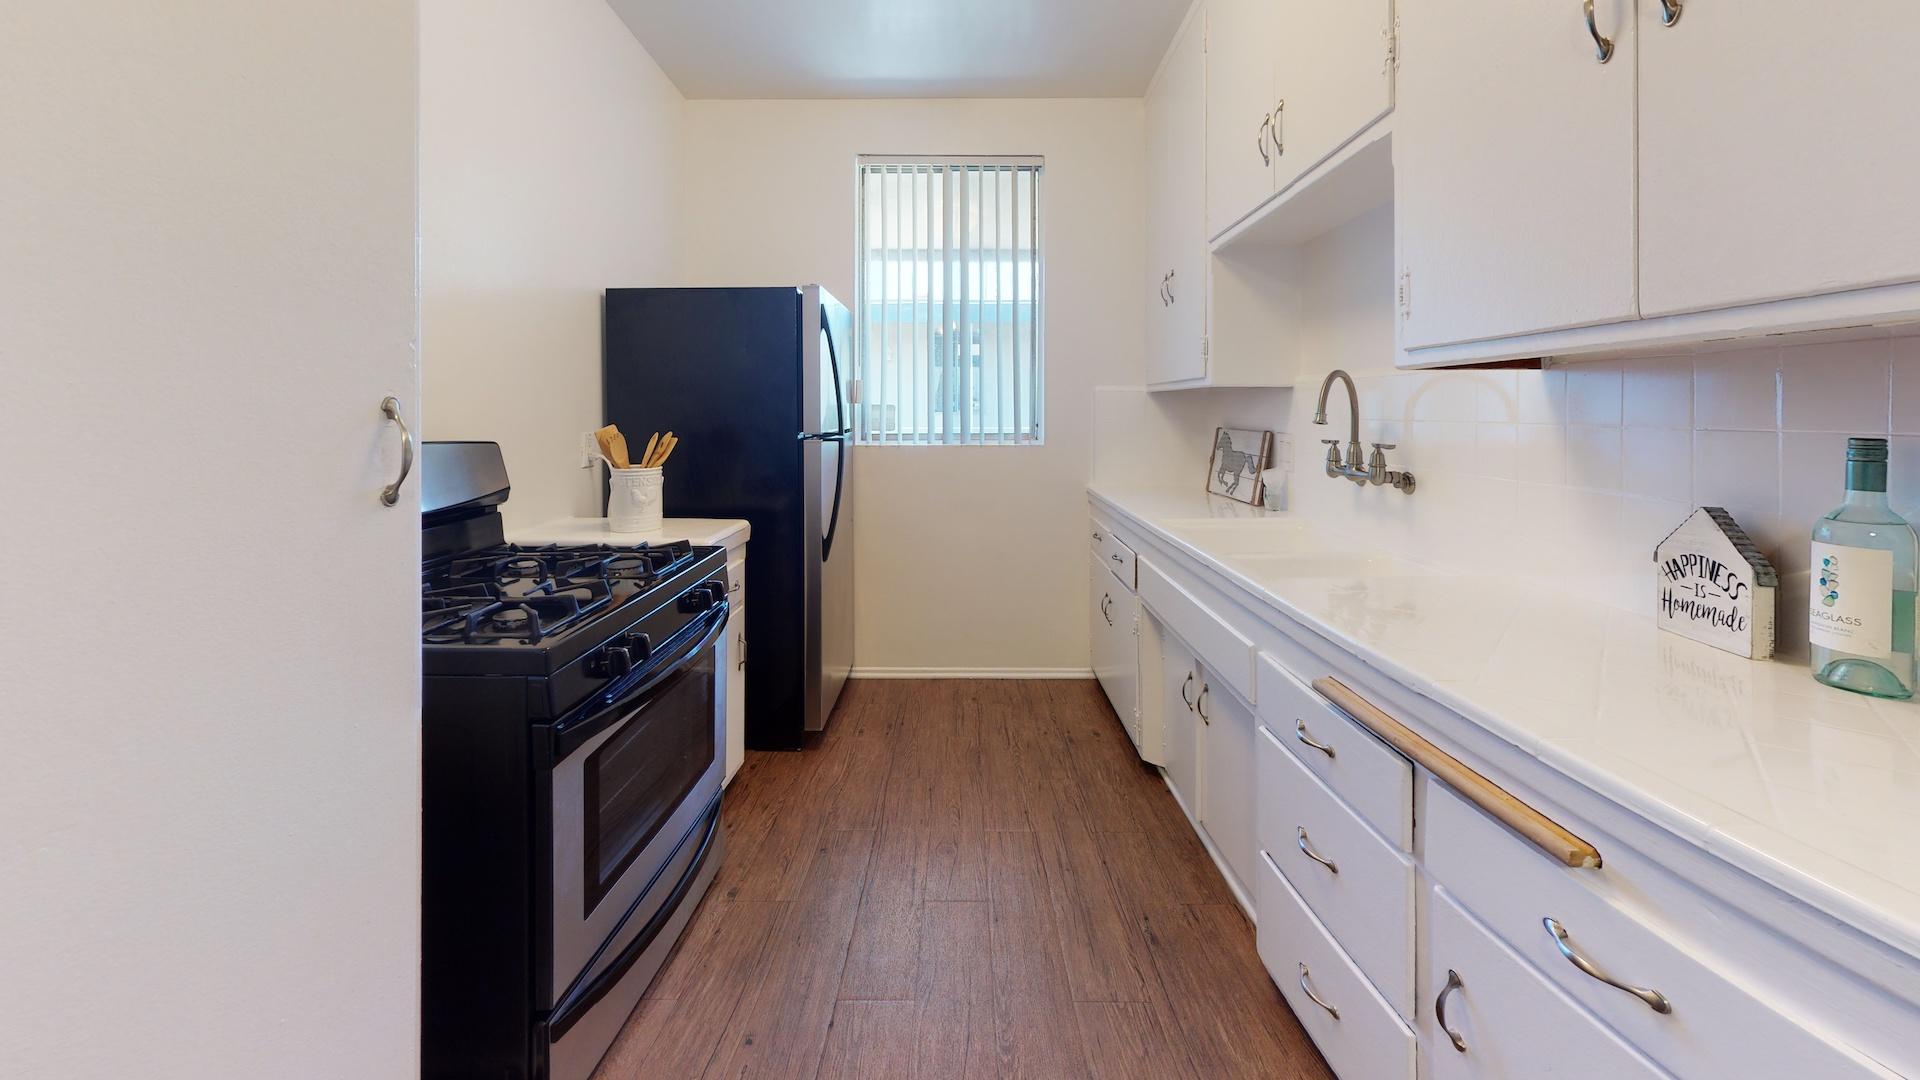 Venice Blvd Apartments | Los Angeles, CA | Kitchen